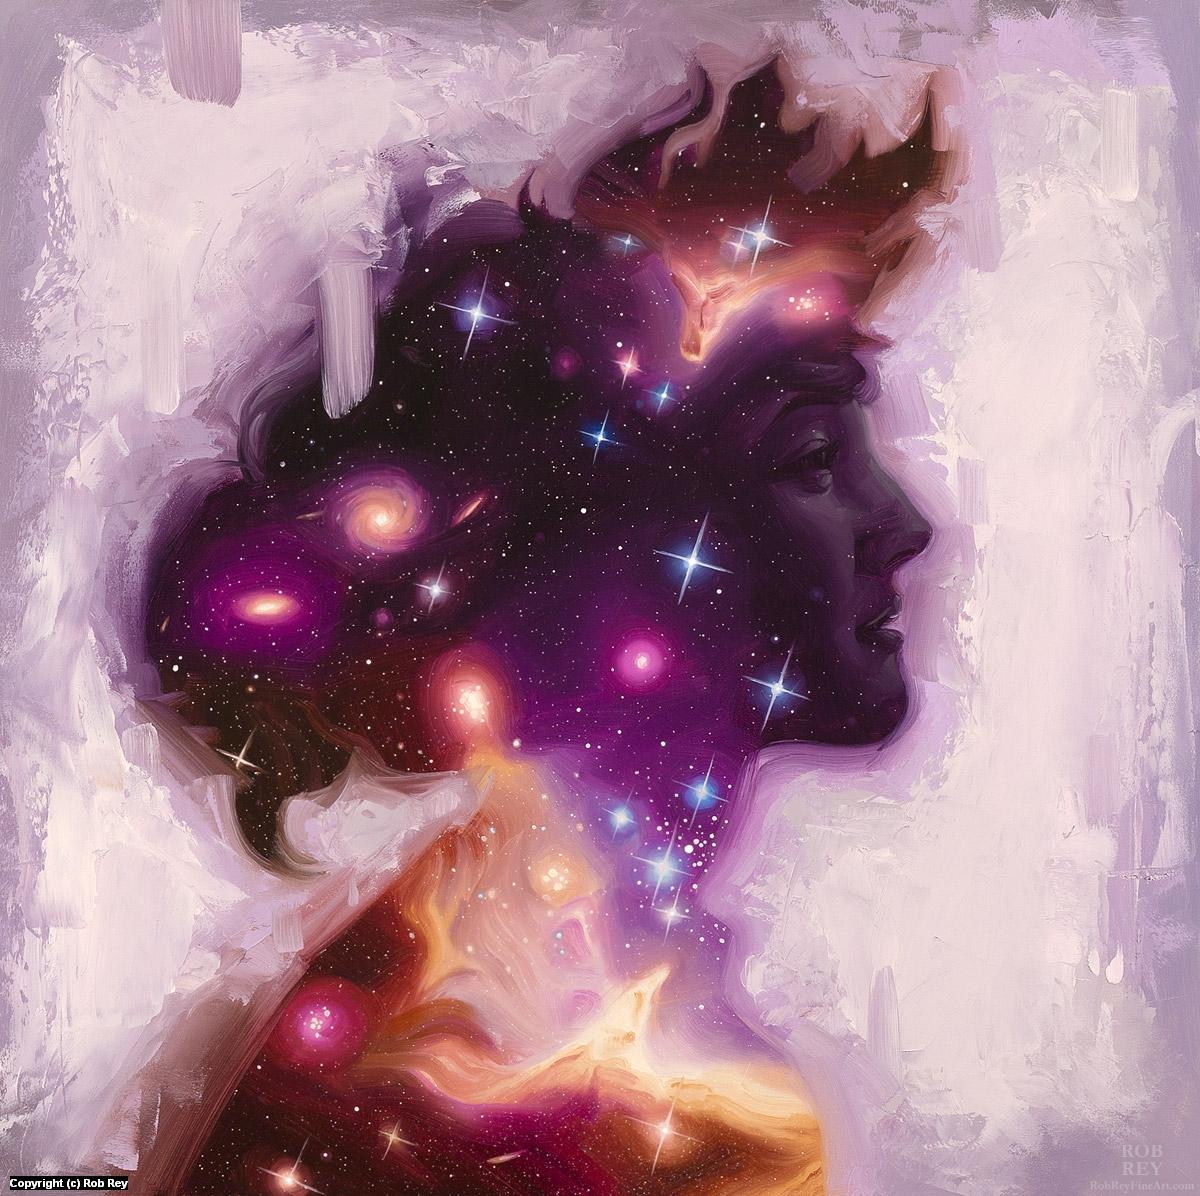 Stardust Gazing Back Artwork by Rob Rey